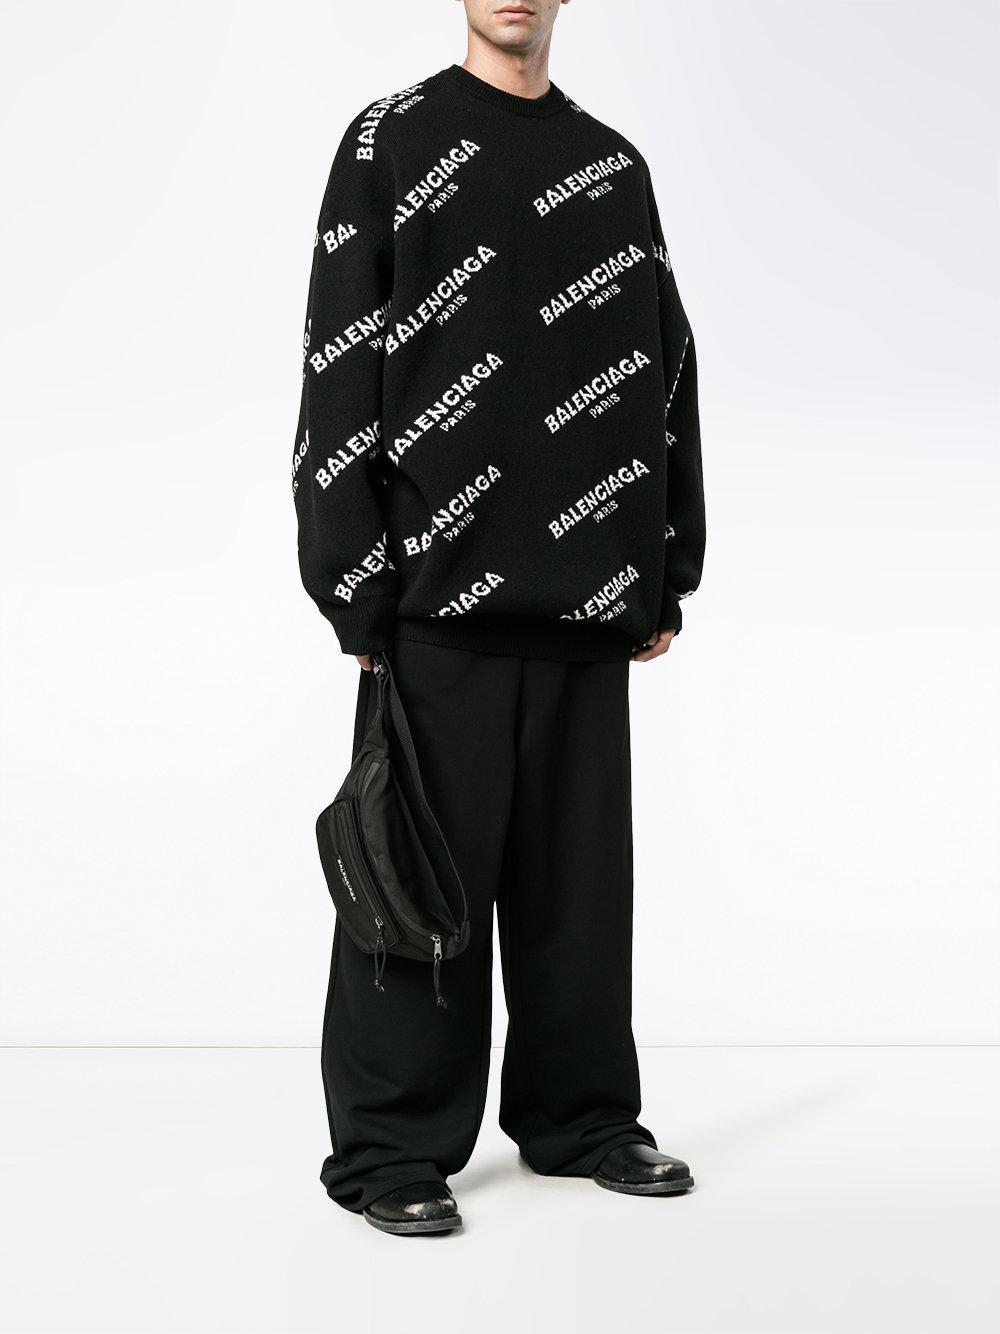 63aec8723e2 Balenciaga Oversized All-over Logo Sweatshirt in Black for Men - Lyst